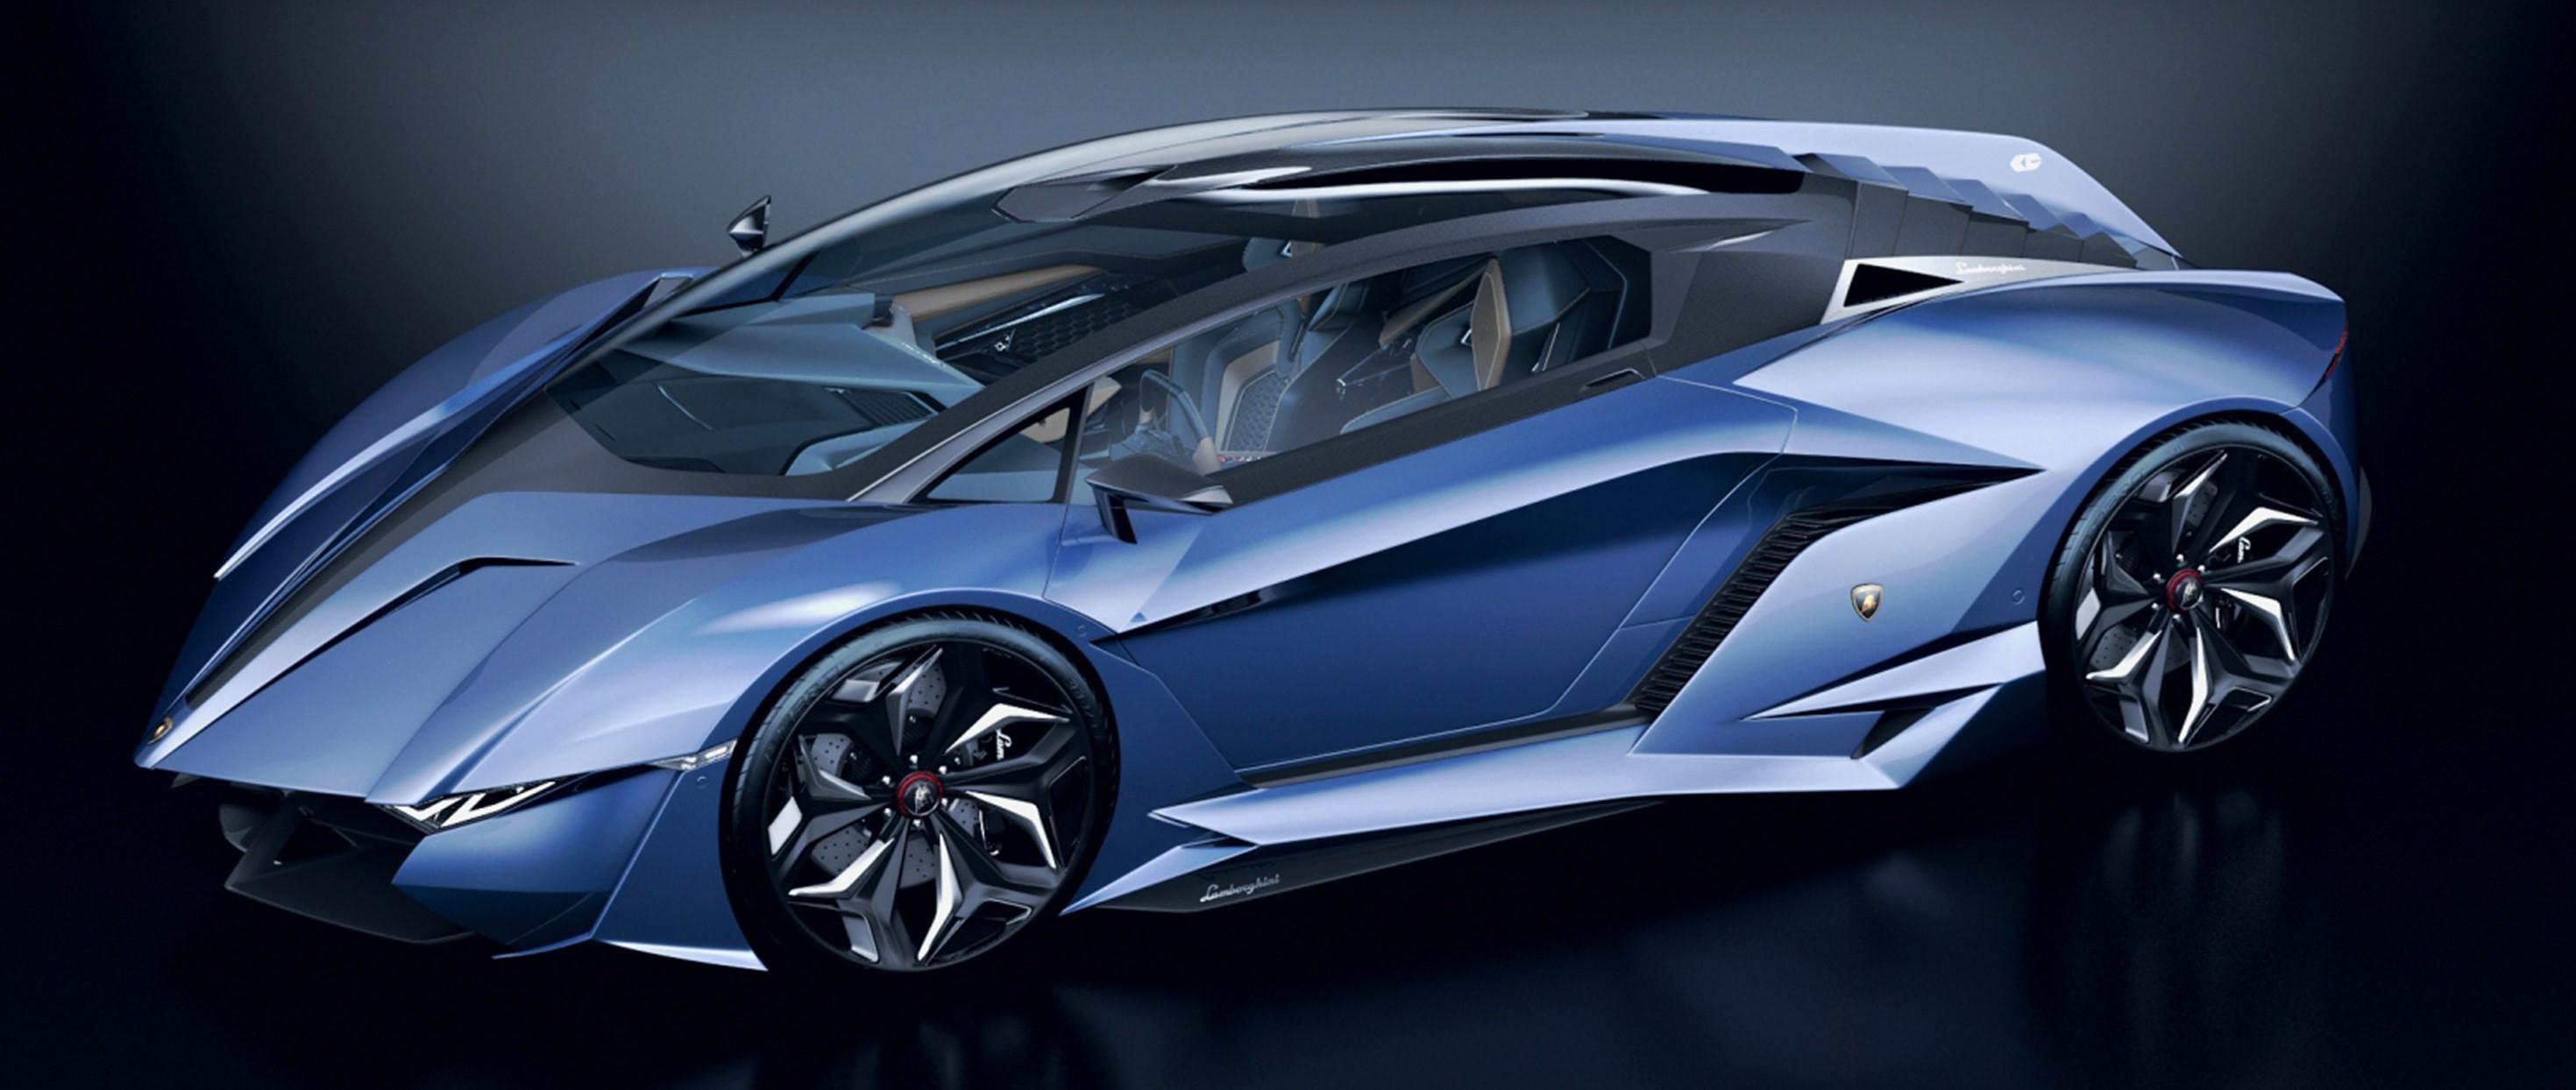 Wallpaper Concept Cars Sports Car Lamborghini Reventon